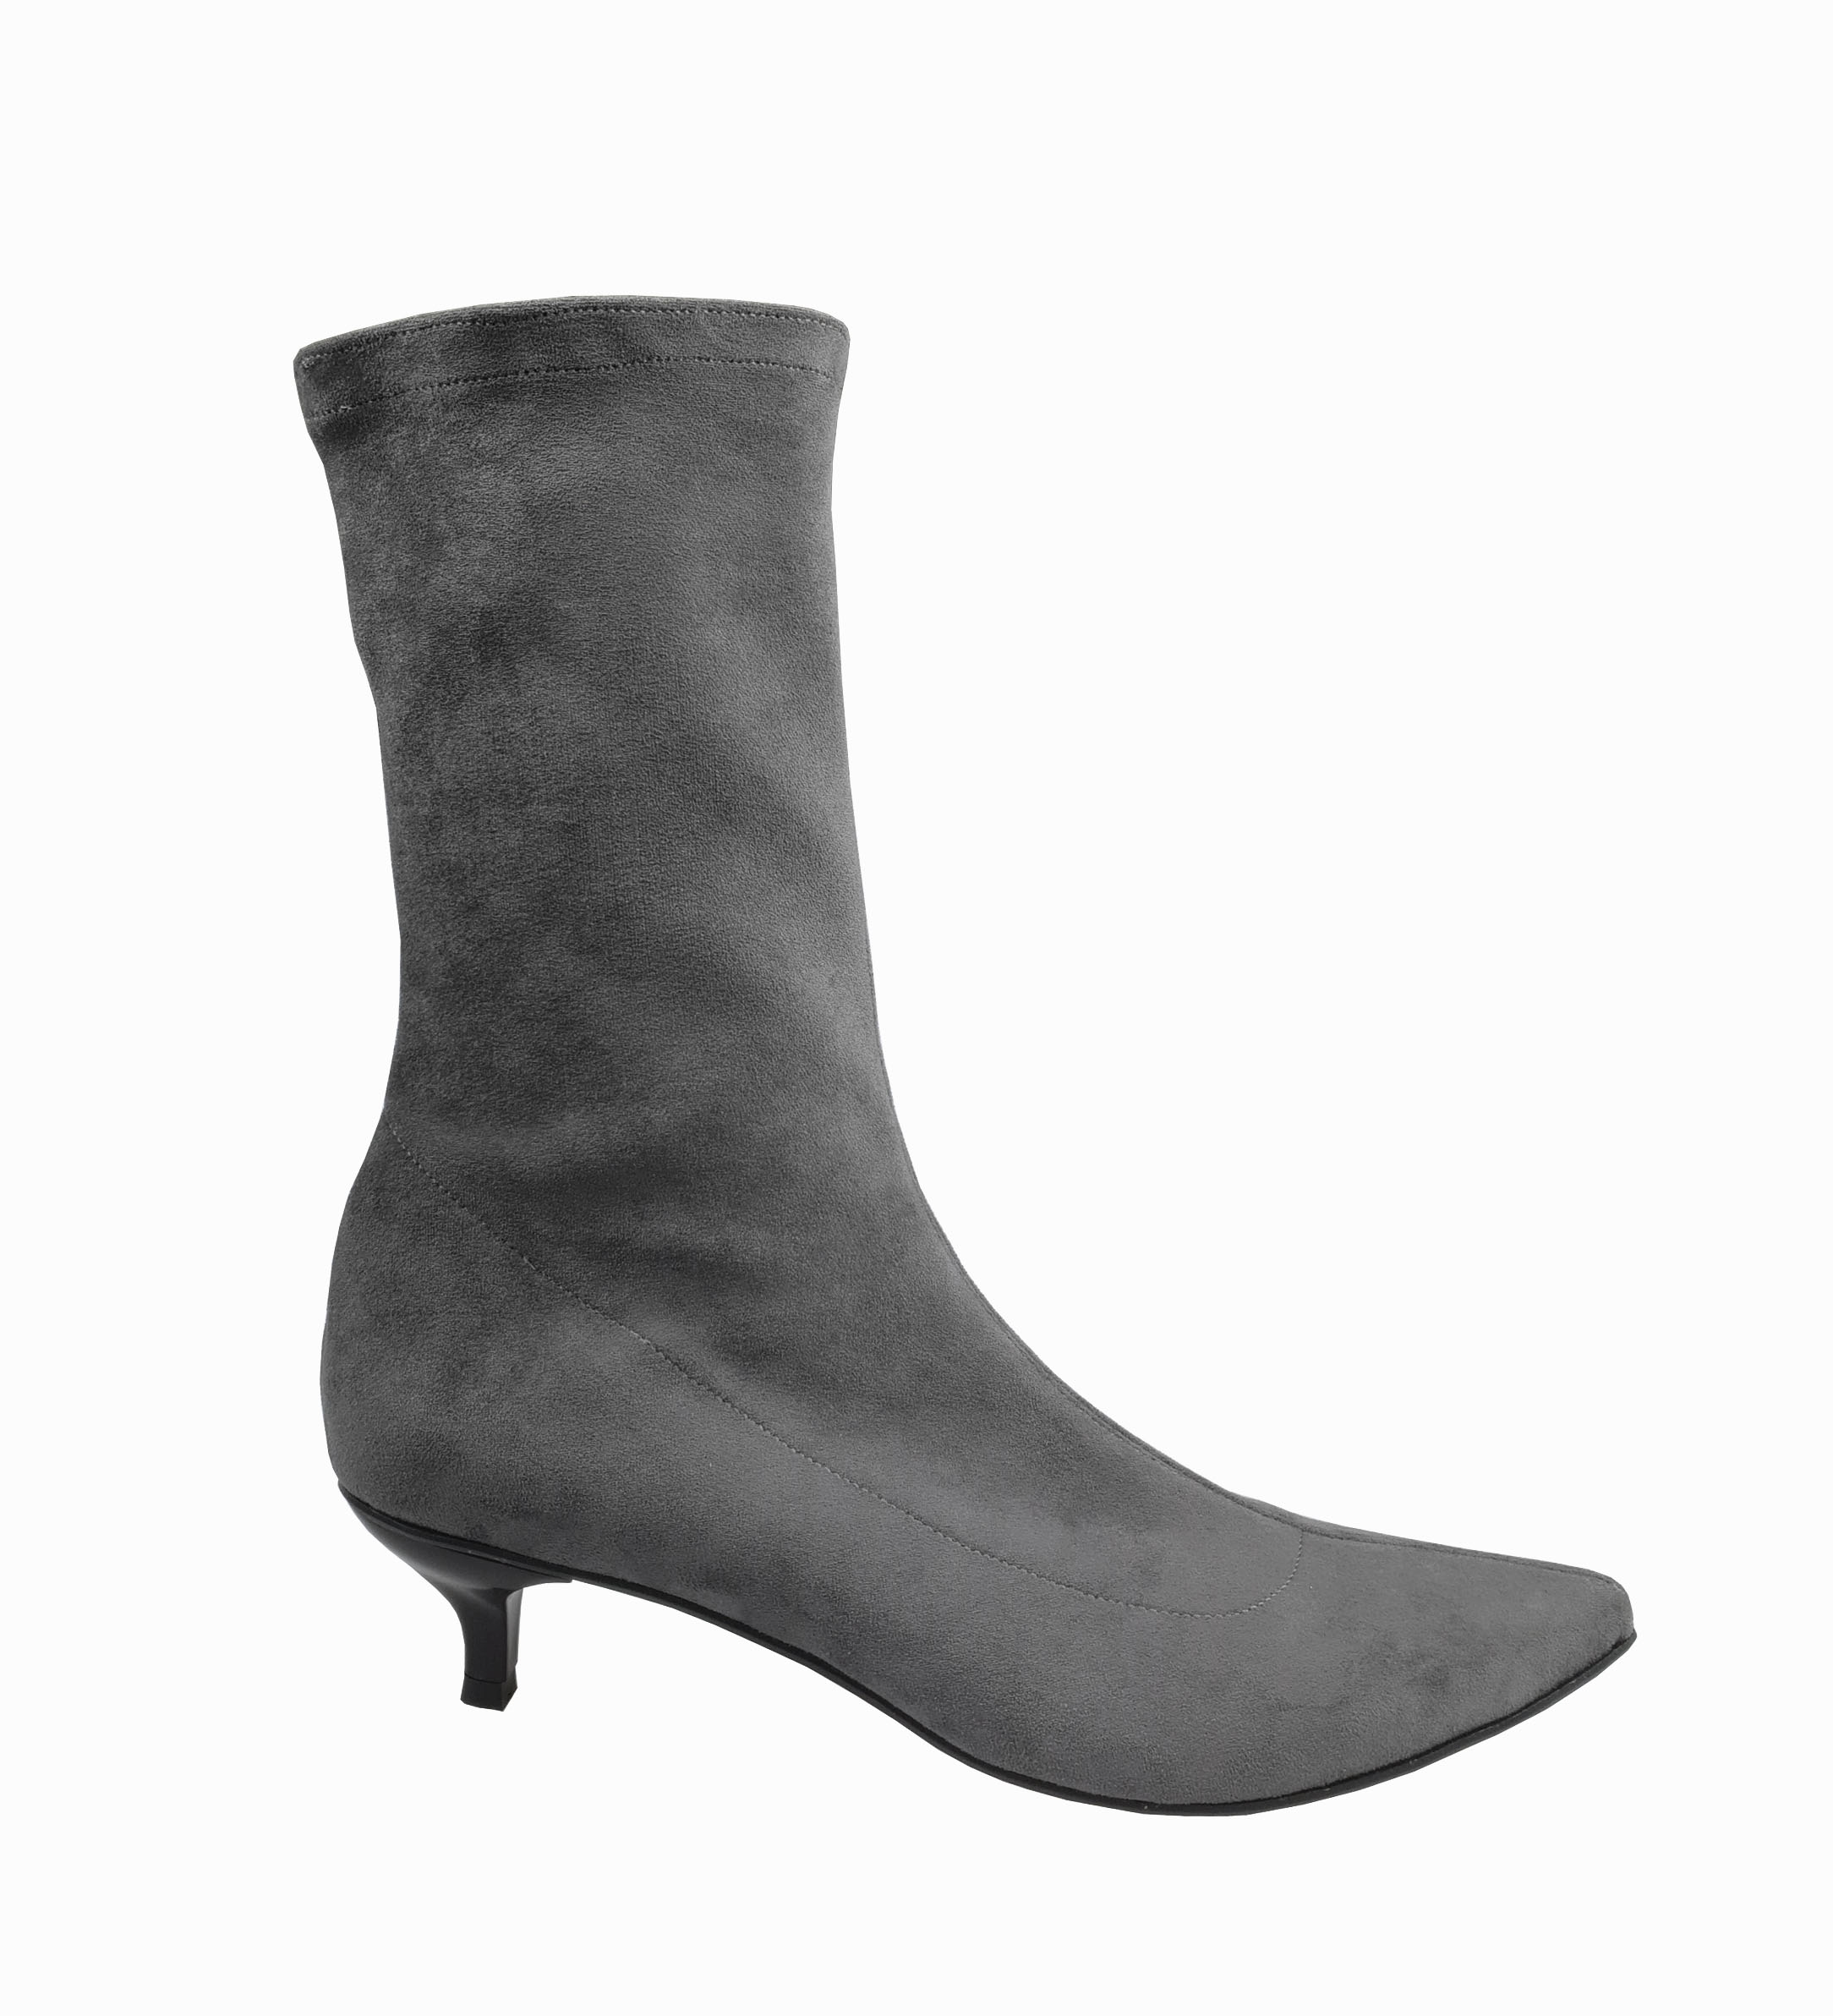 Kitty low heel sock boots in grey